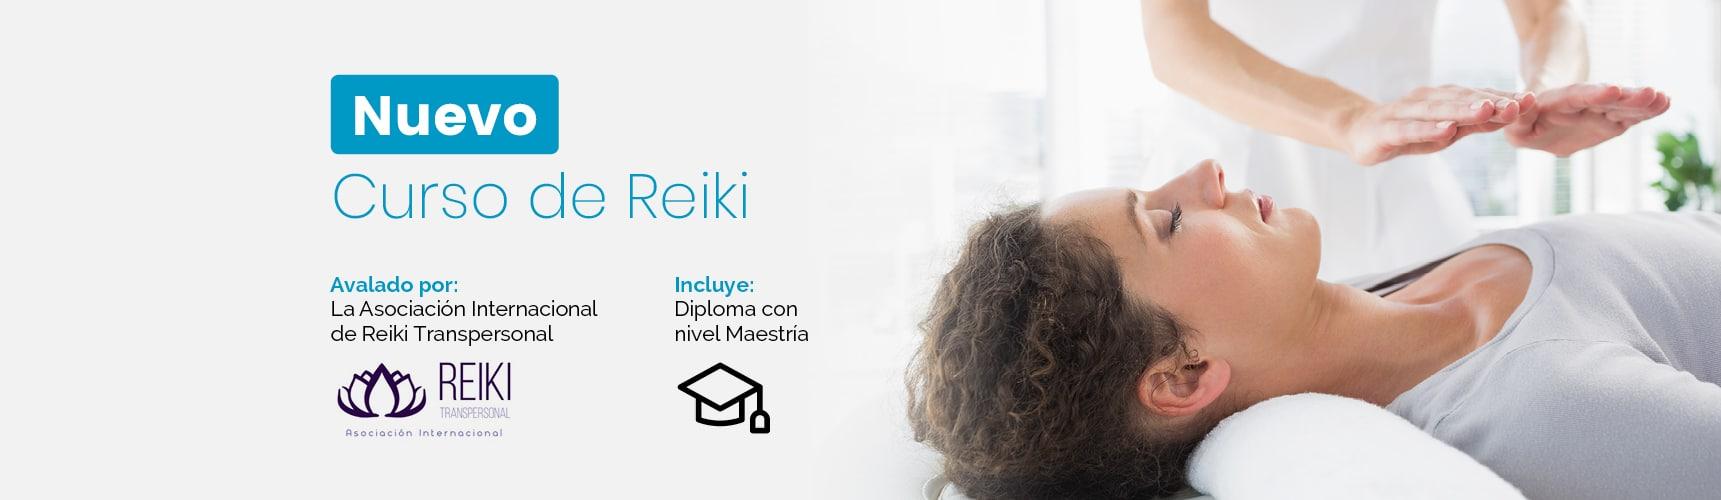 Nuevo curso de Reiki